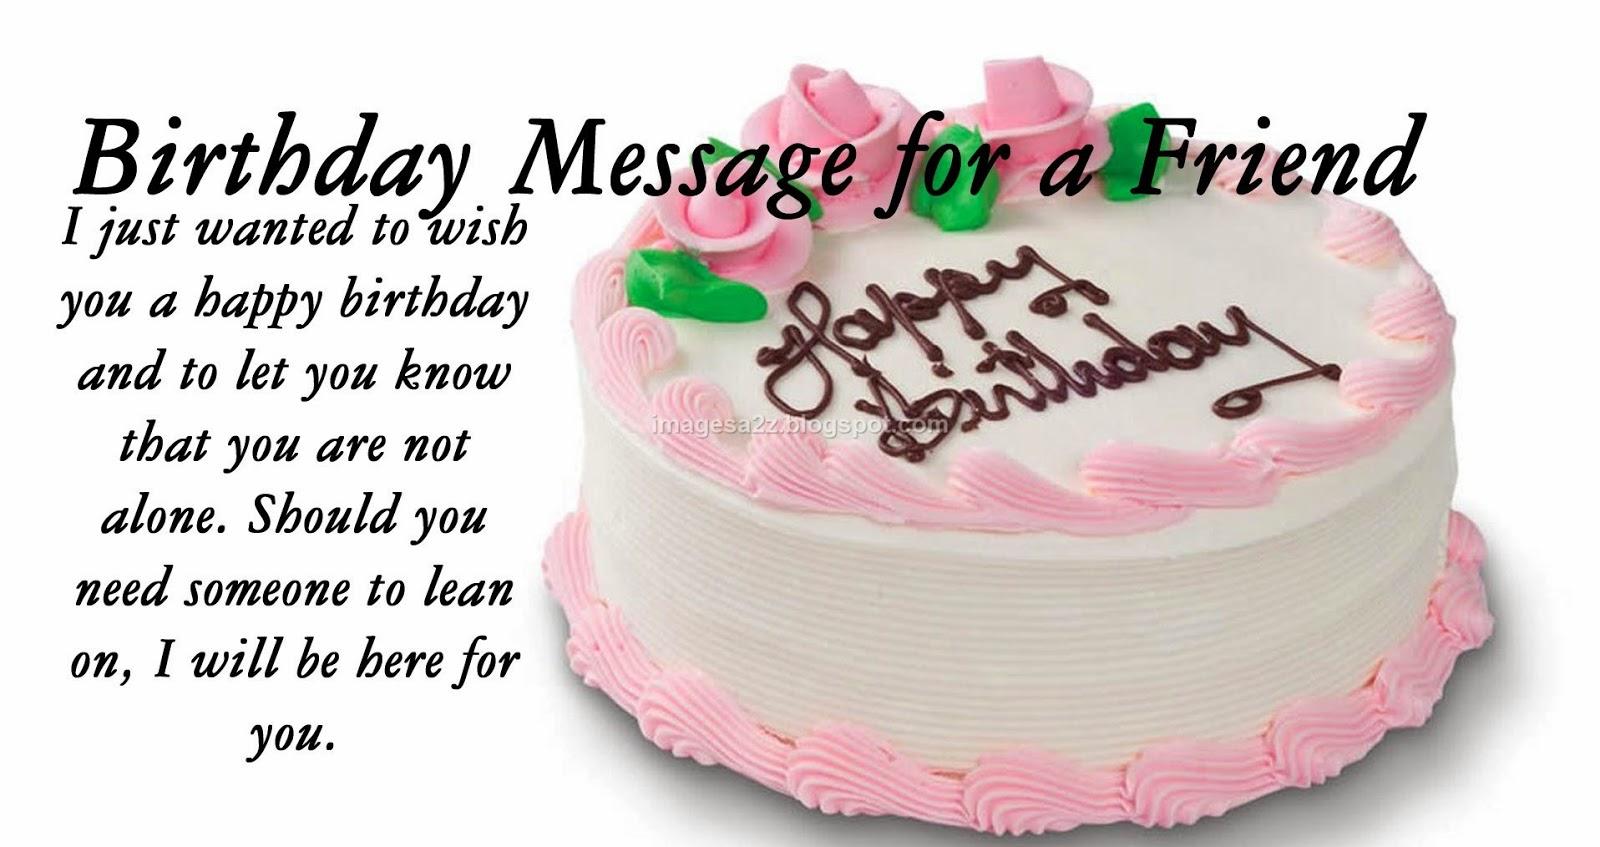 Birthday Wishes Free Ecards Funny Wishes Happy Birthday